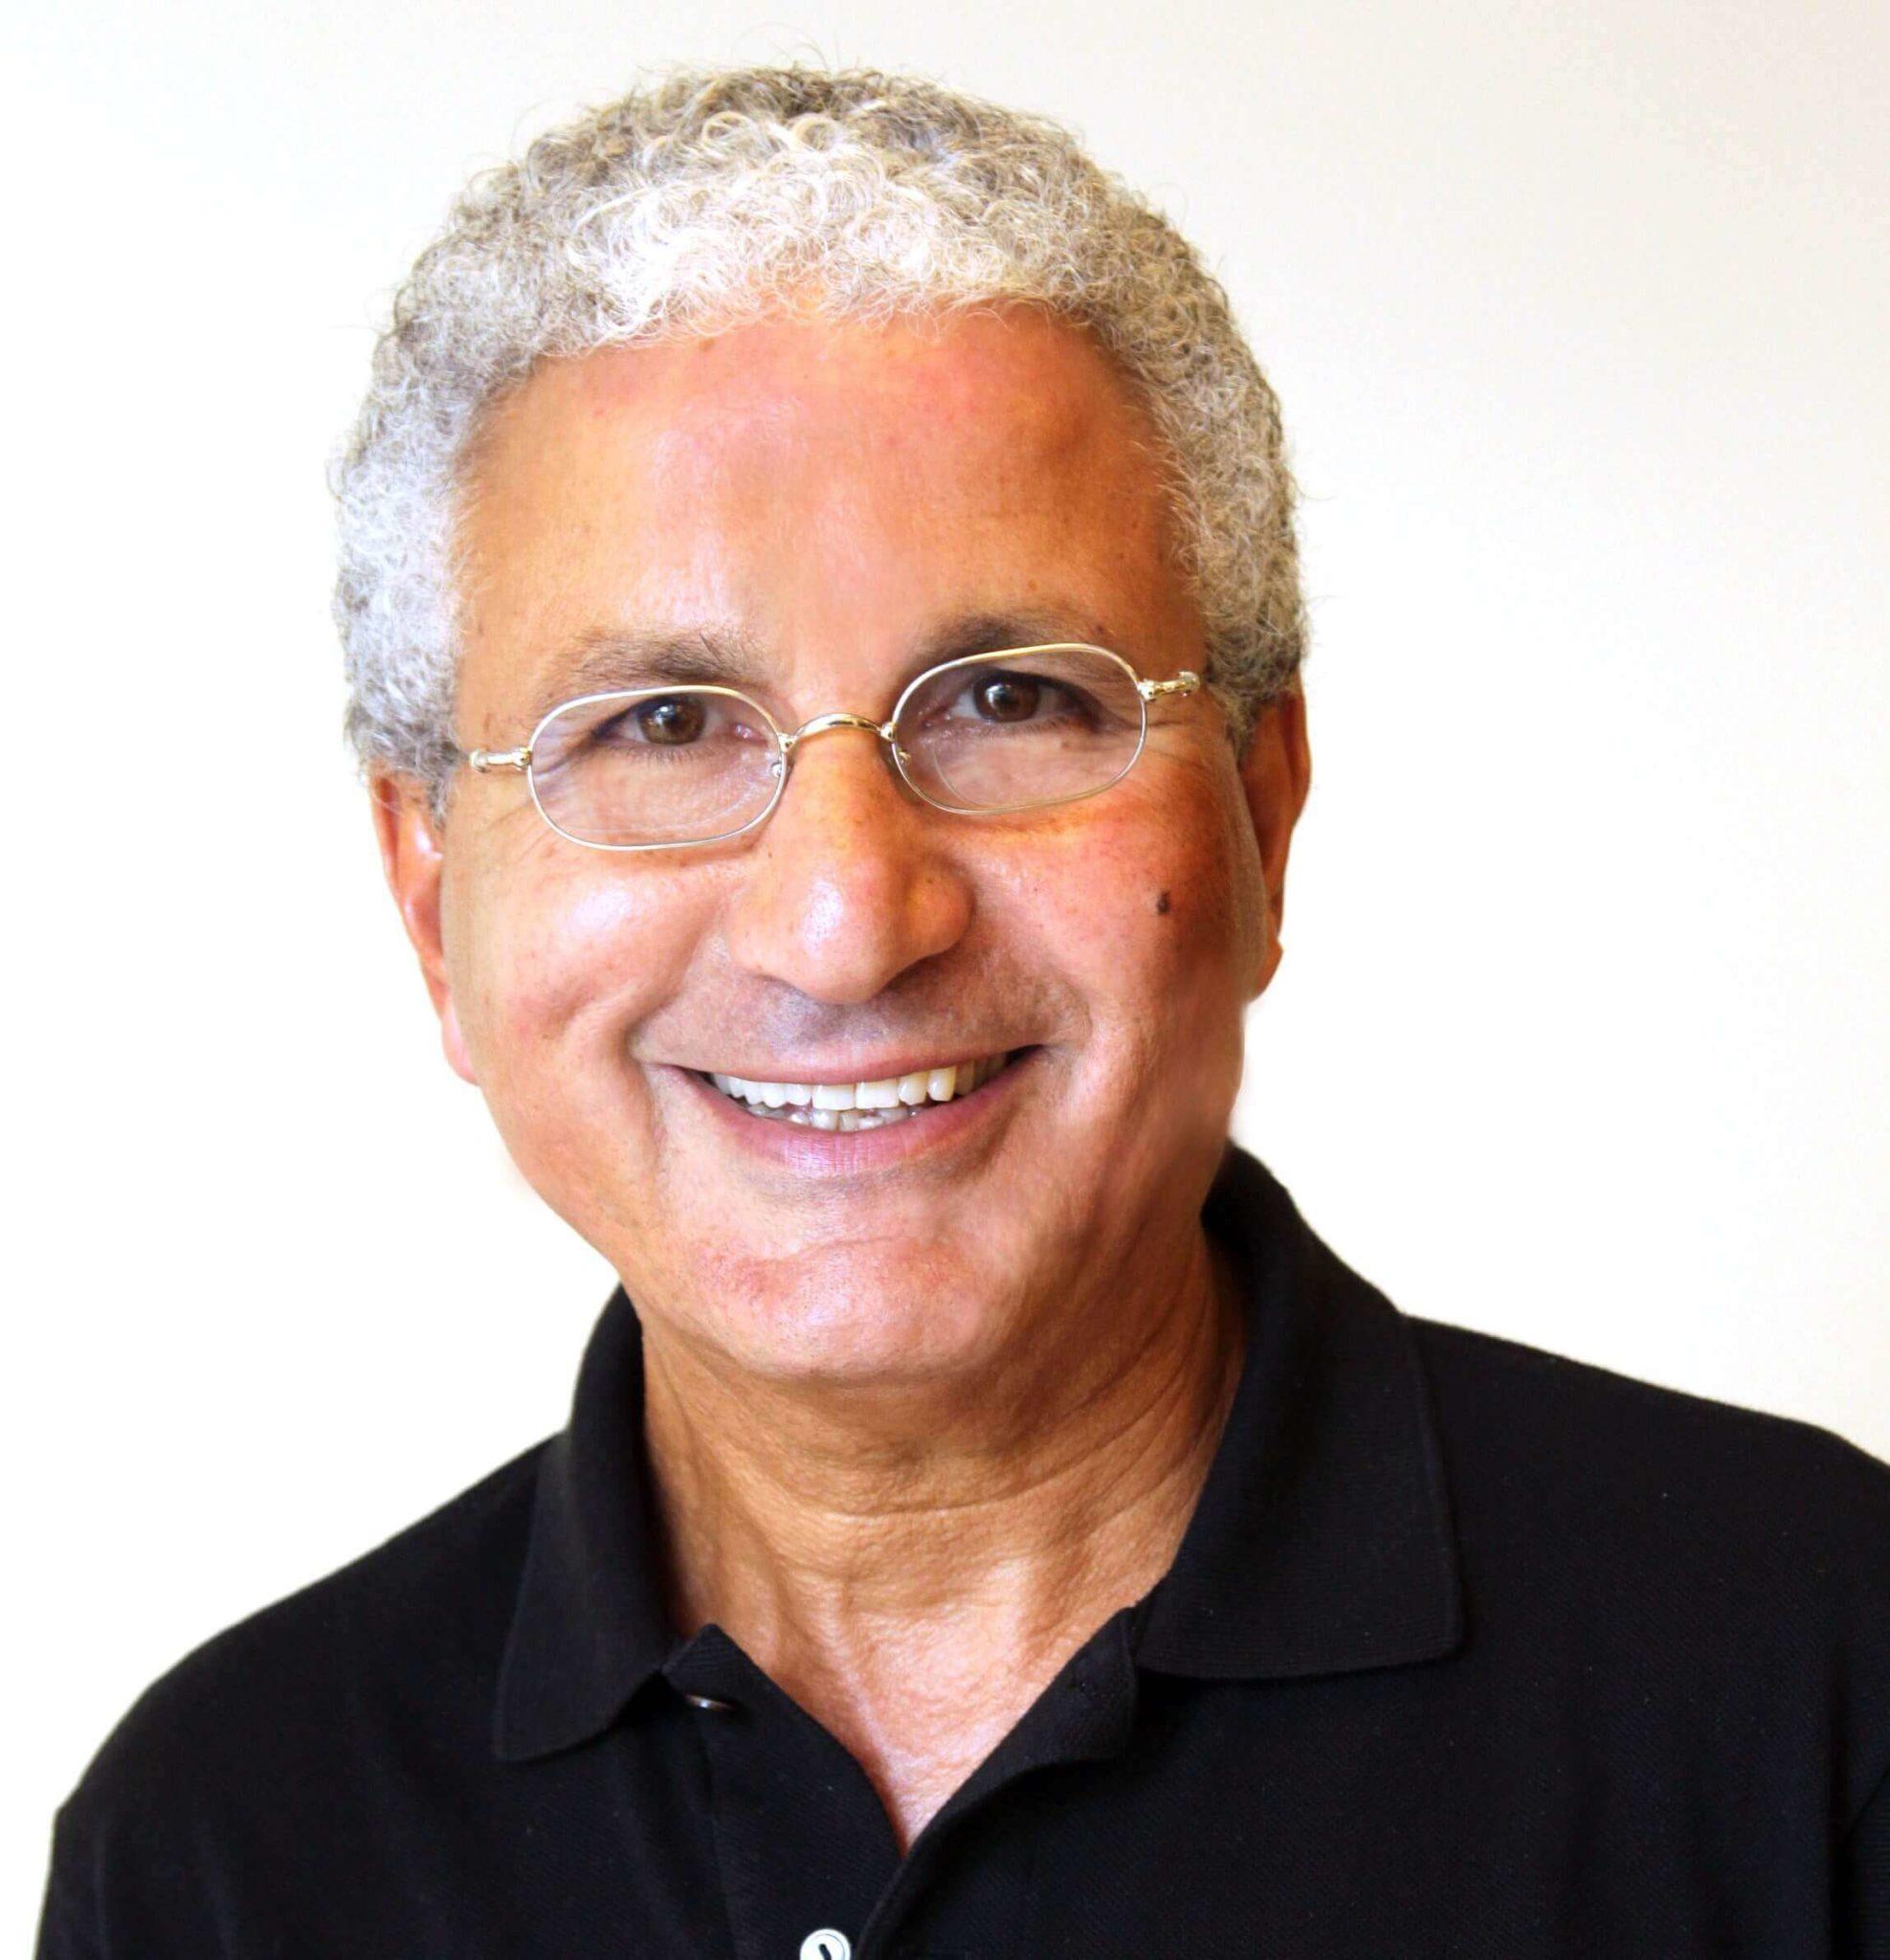 משה אדרי, ממייסדי Screen IL